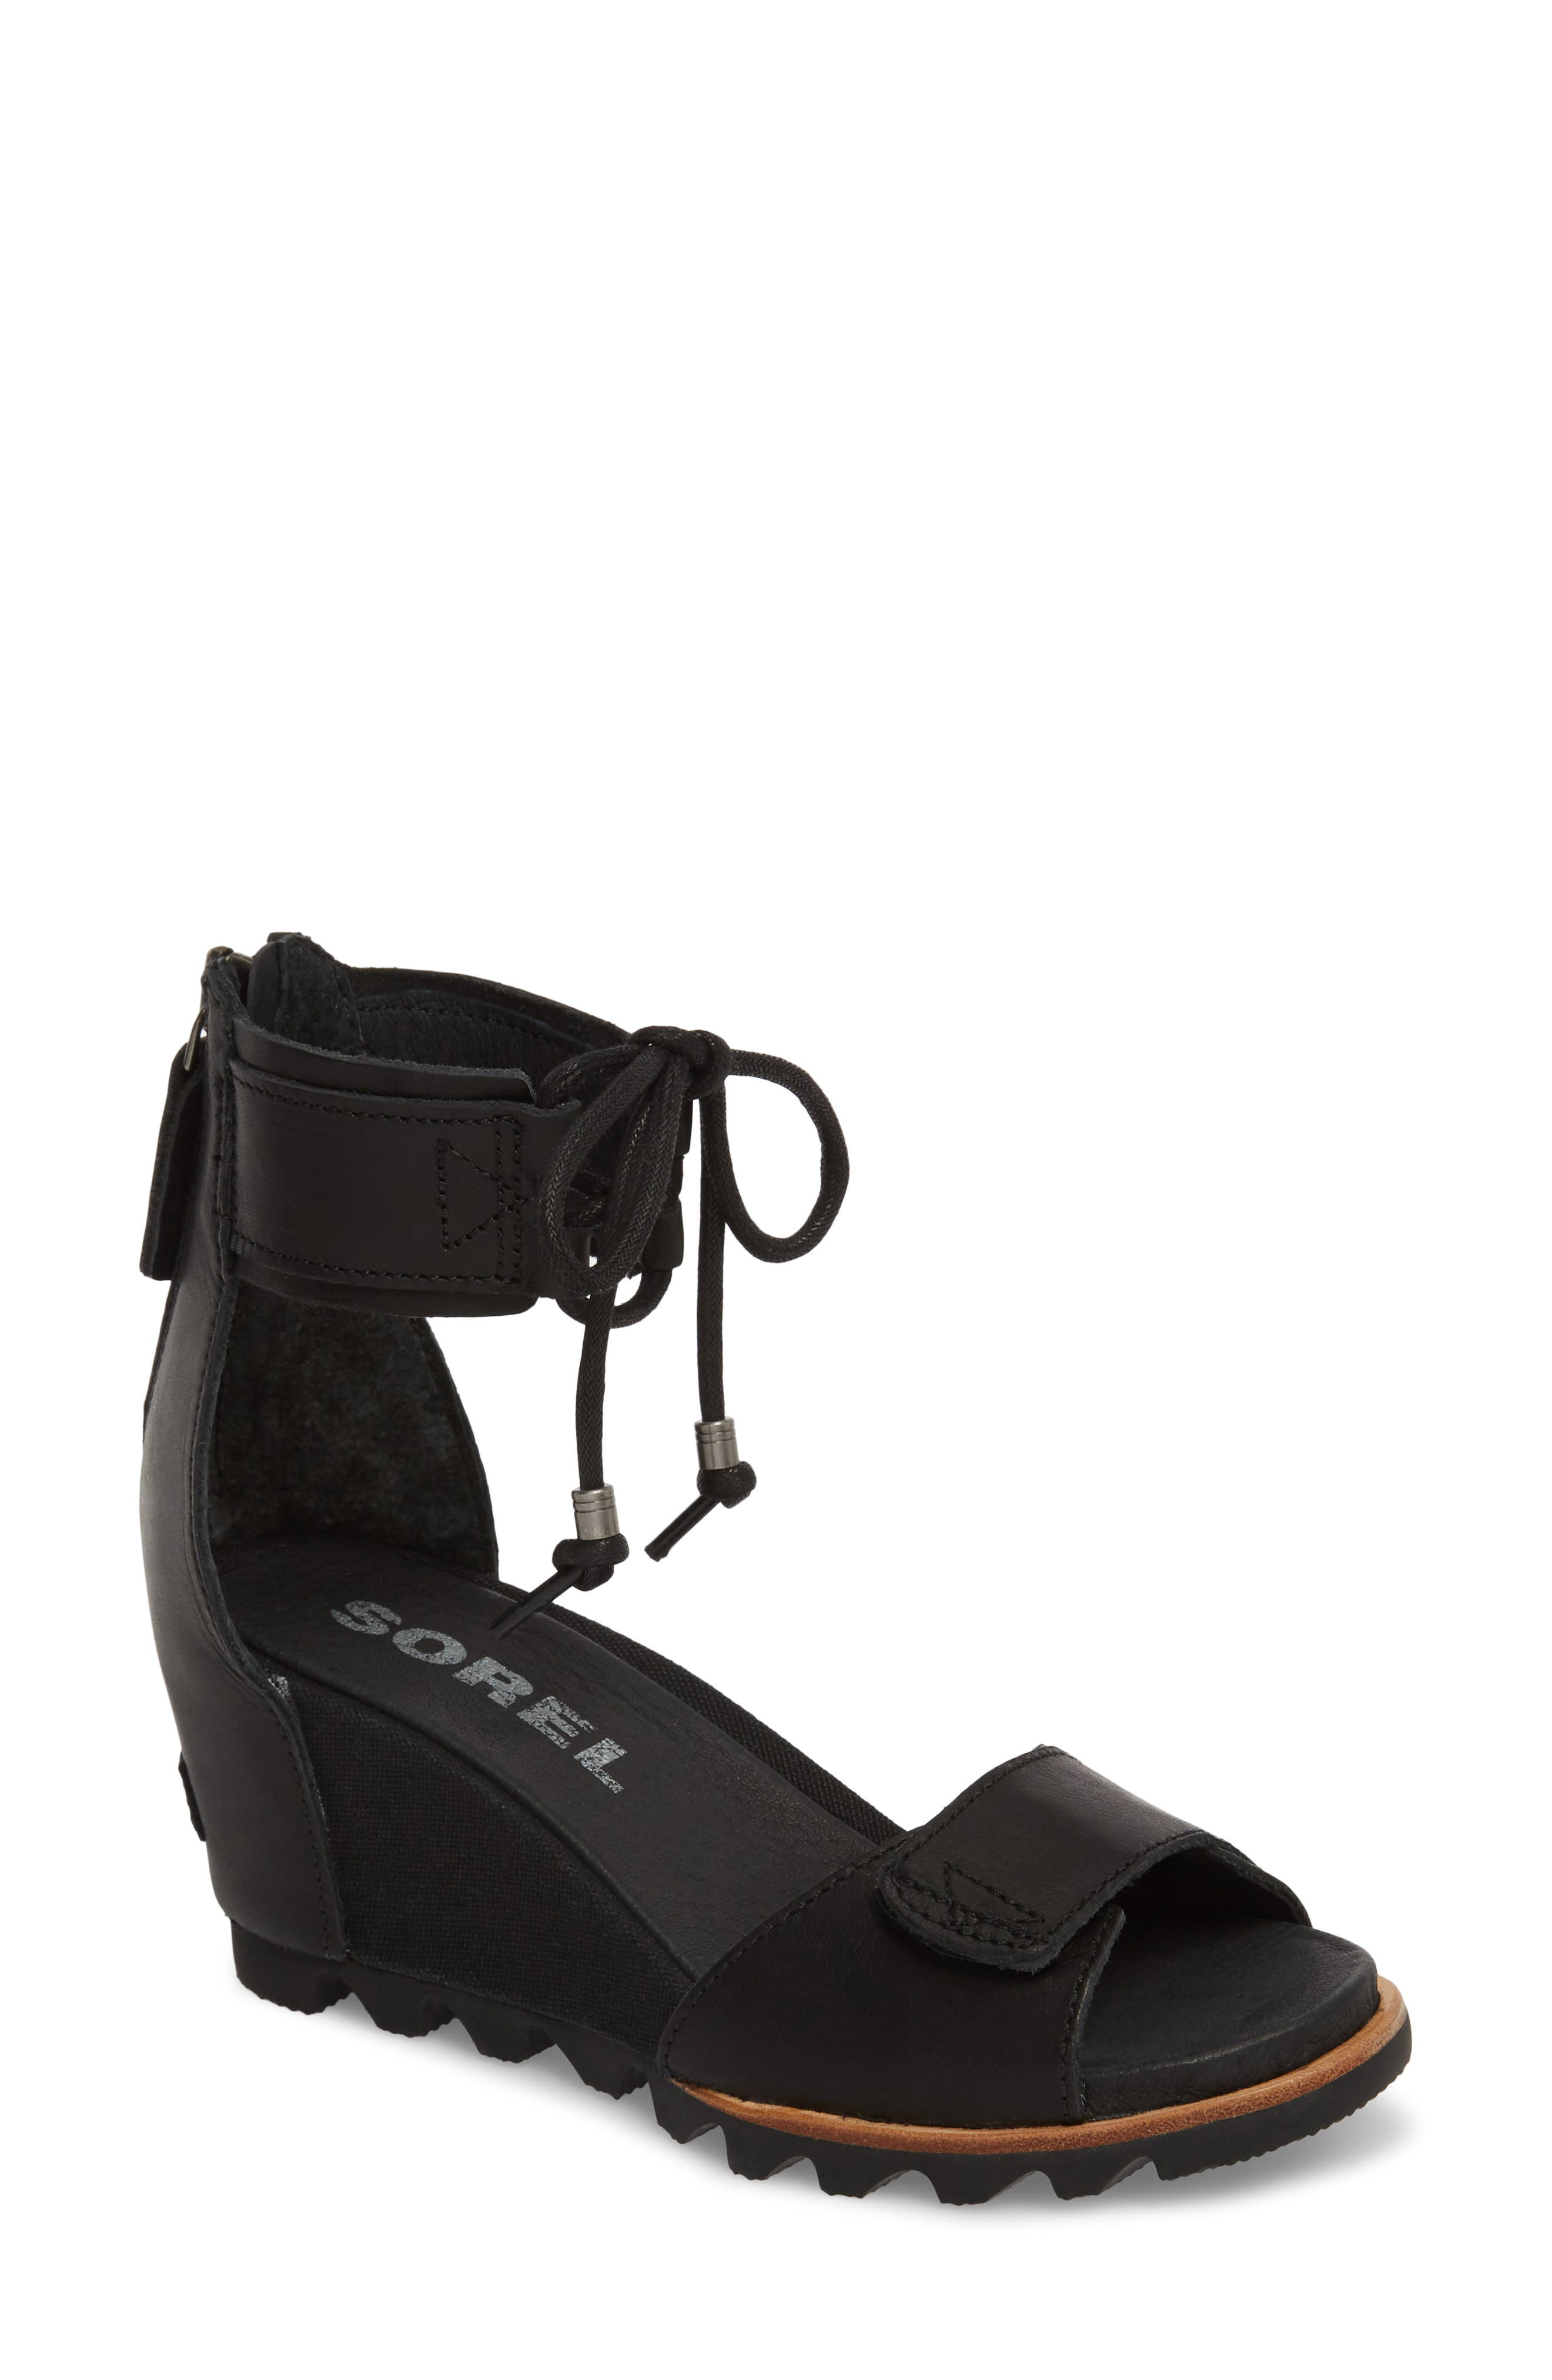 Joanie Cuff Wedge Sandal,                         Main,                         color,